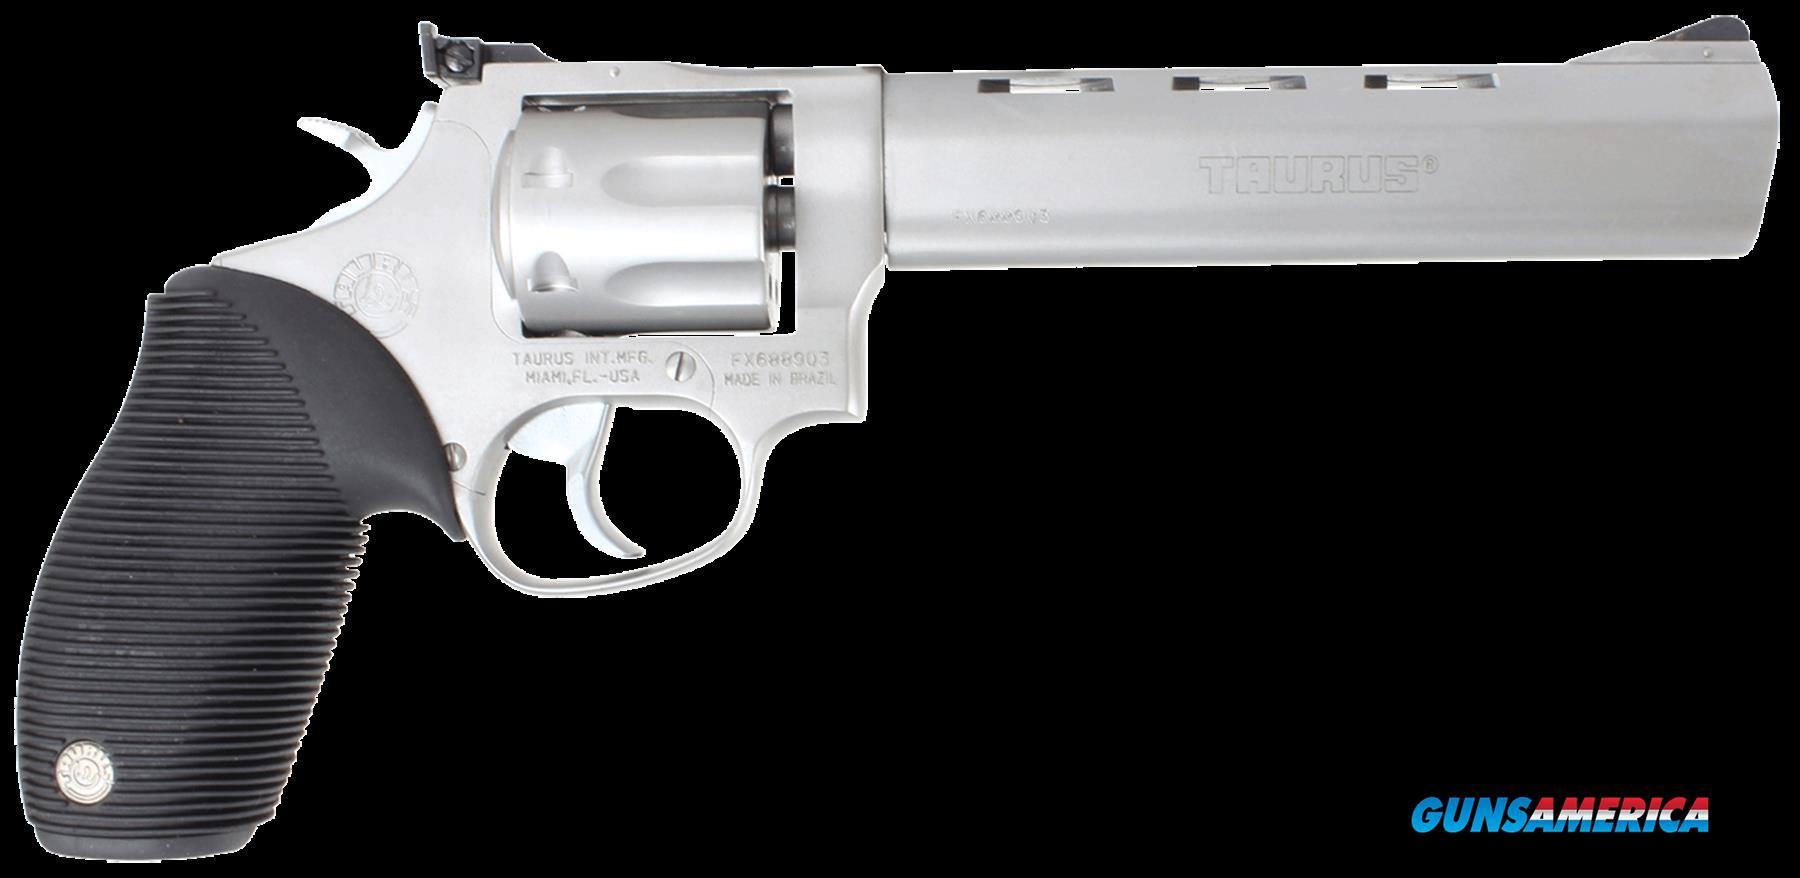 Taurus 17, Tau 2170069      17 17hmr 6.5 As Tkr           Mss  Guns > Pistols > 1911 Pistol Copies (non-Colt)